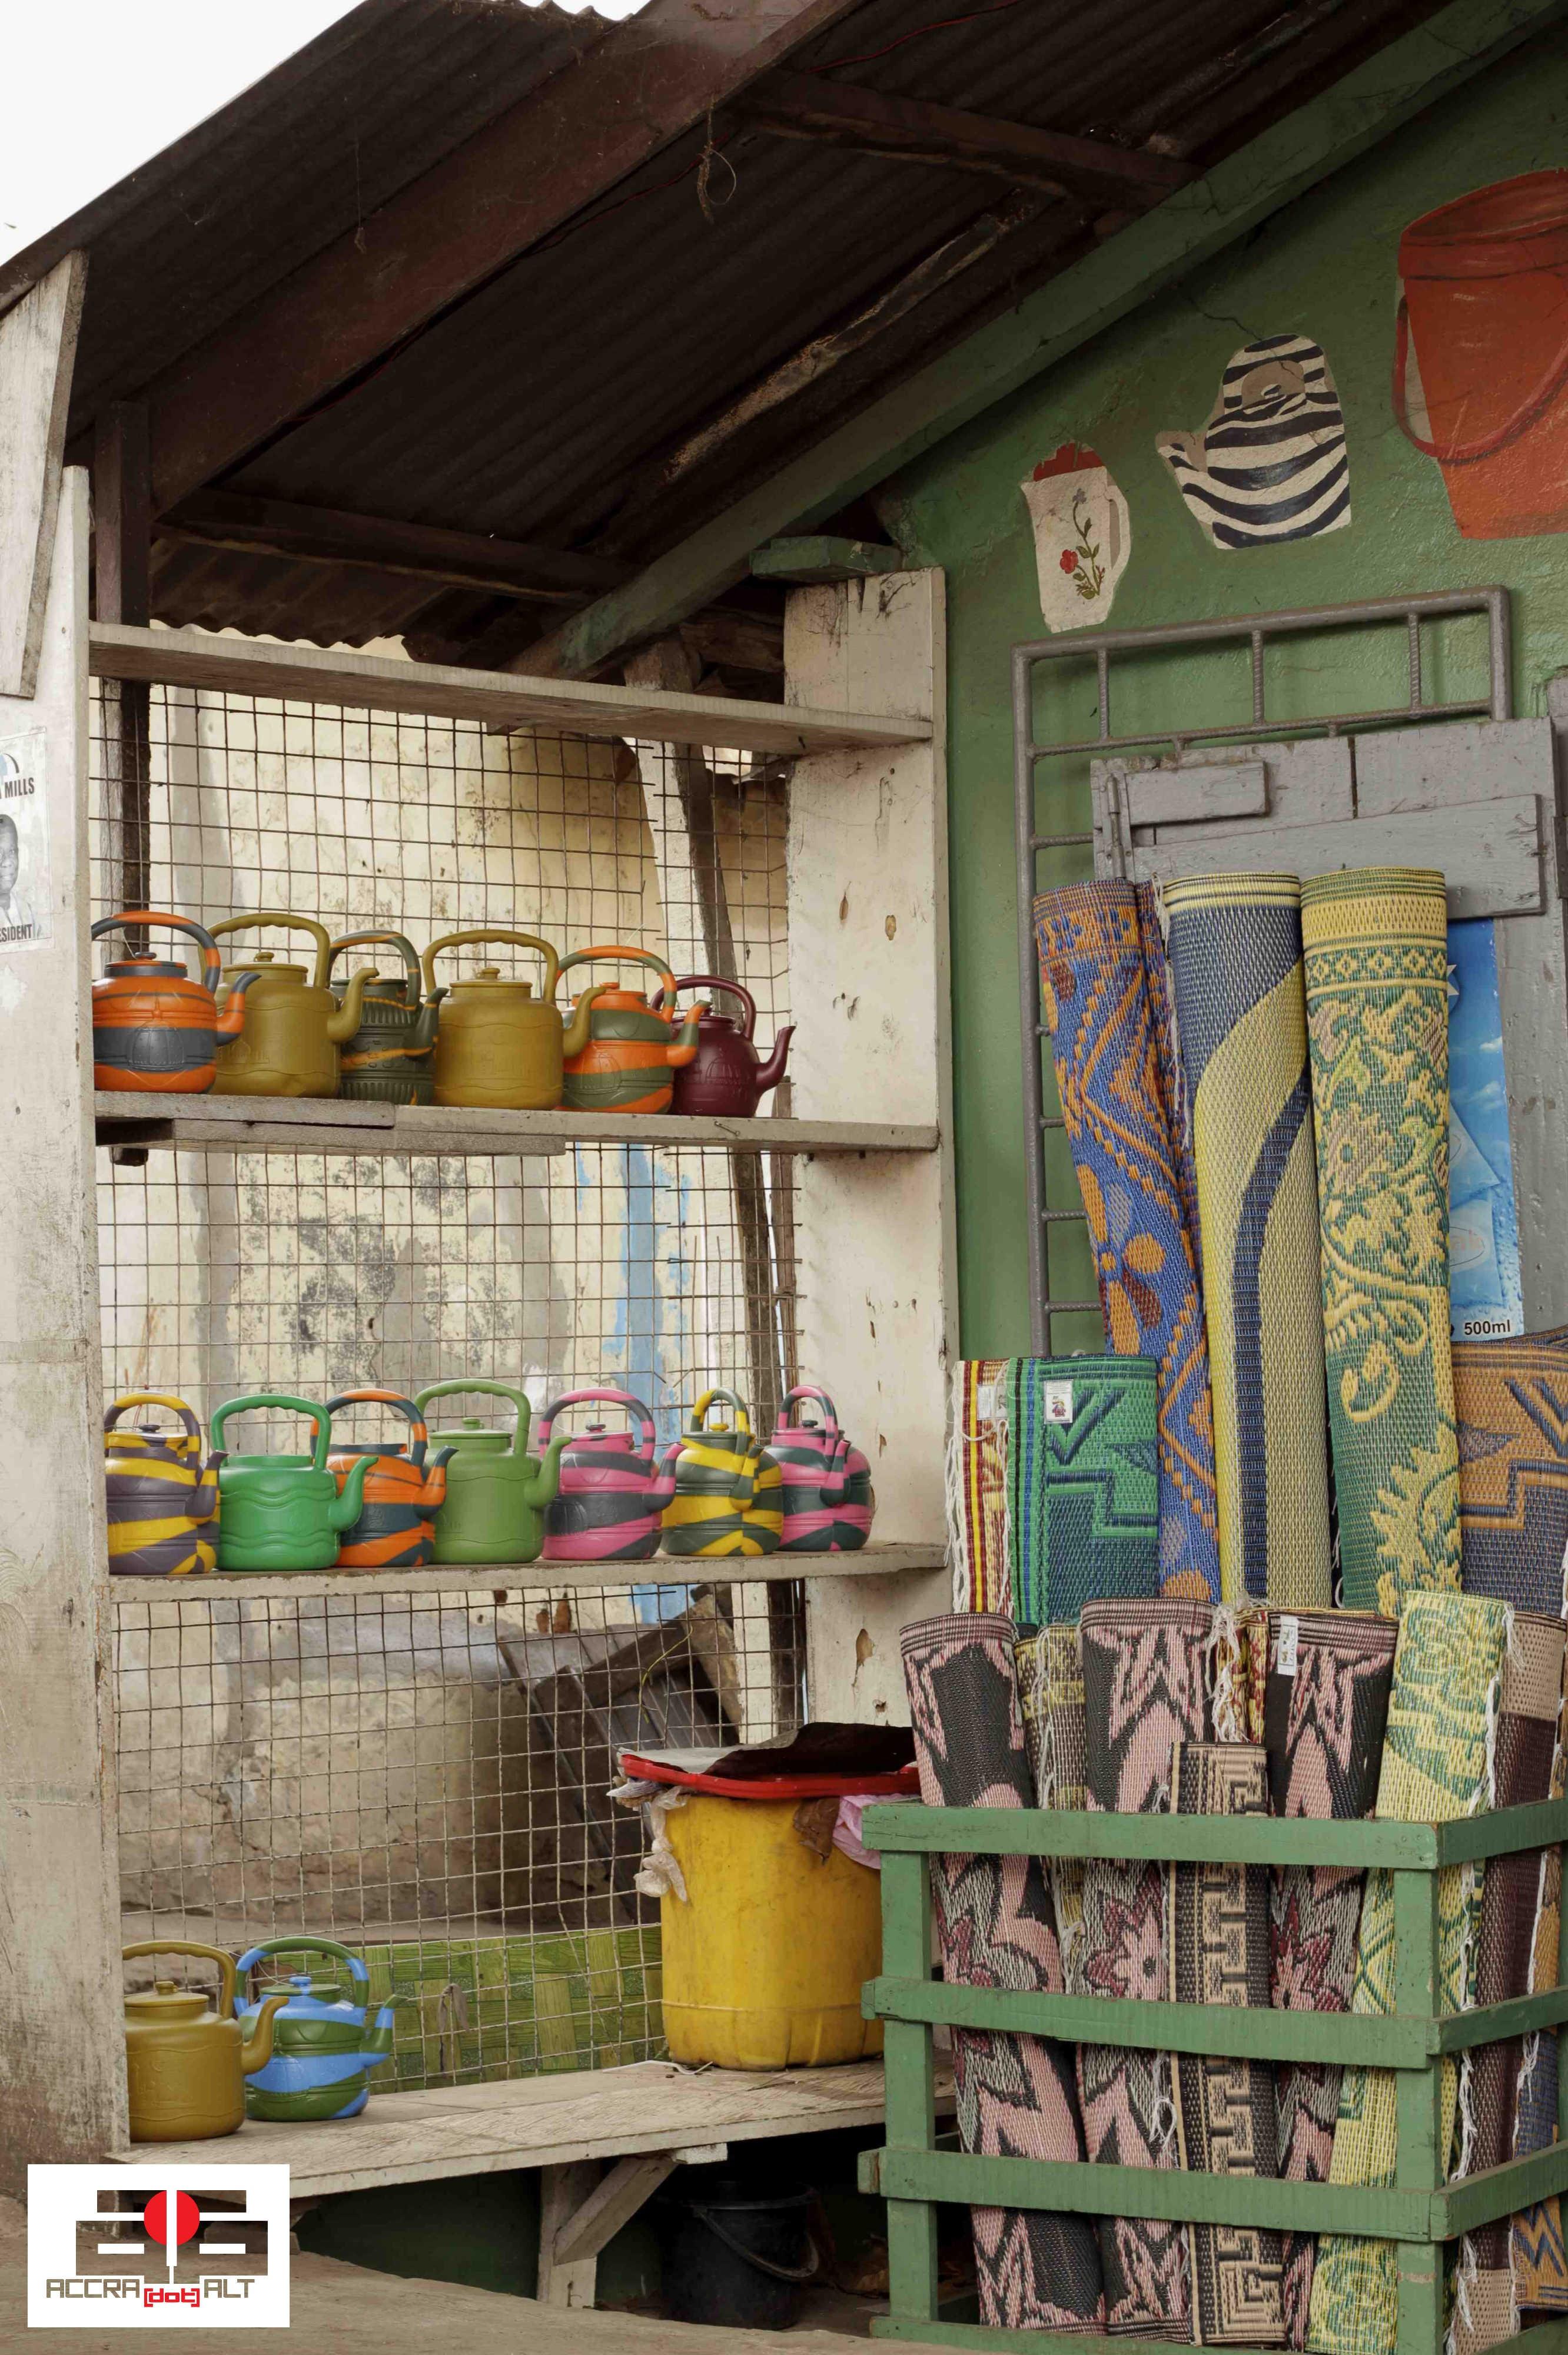 On Sale: Funky Tea Kettles & Straw Mats